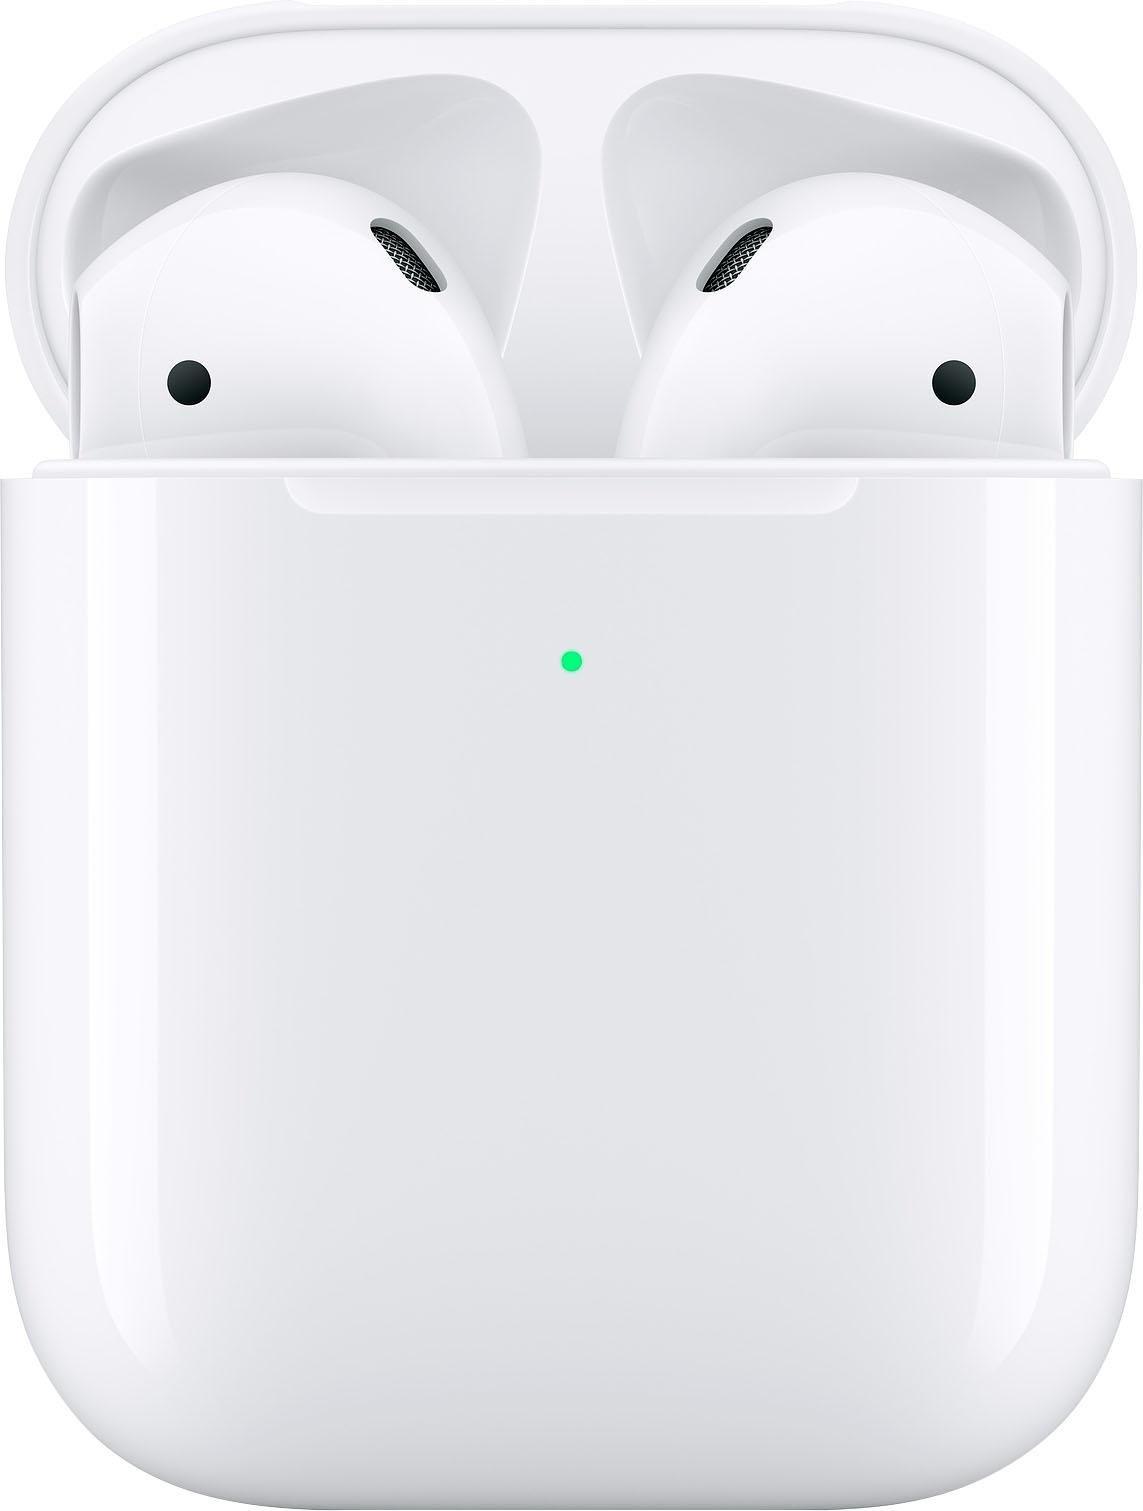 Apple »AirPods met Wireless Charging Case 2019« in-ear-hoofdtelefoon (bluetooth, spraakbesturing) goedkoop op otto.nl kopen